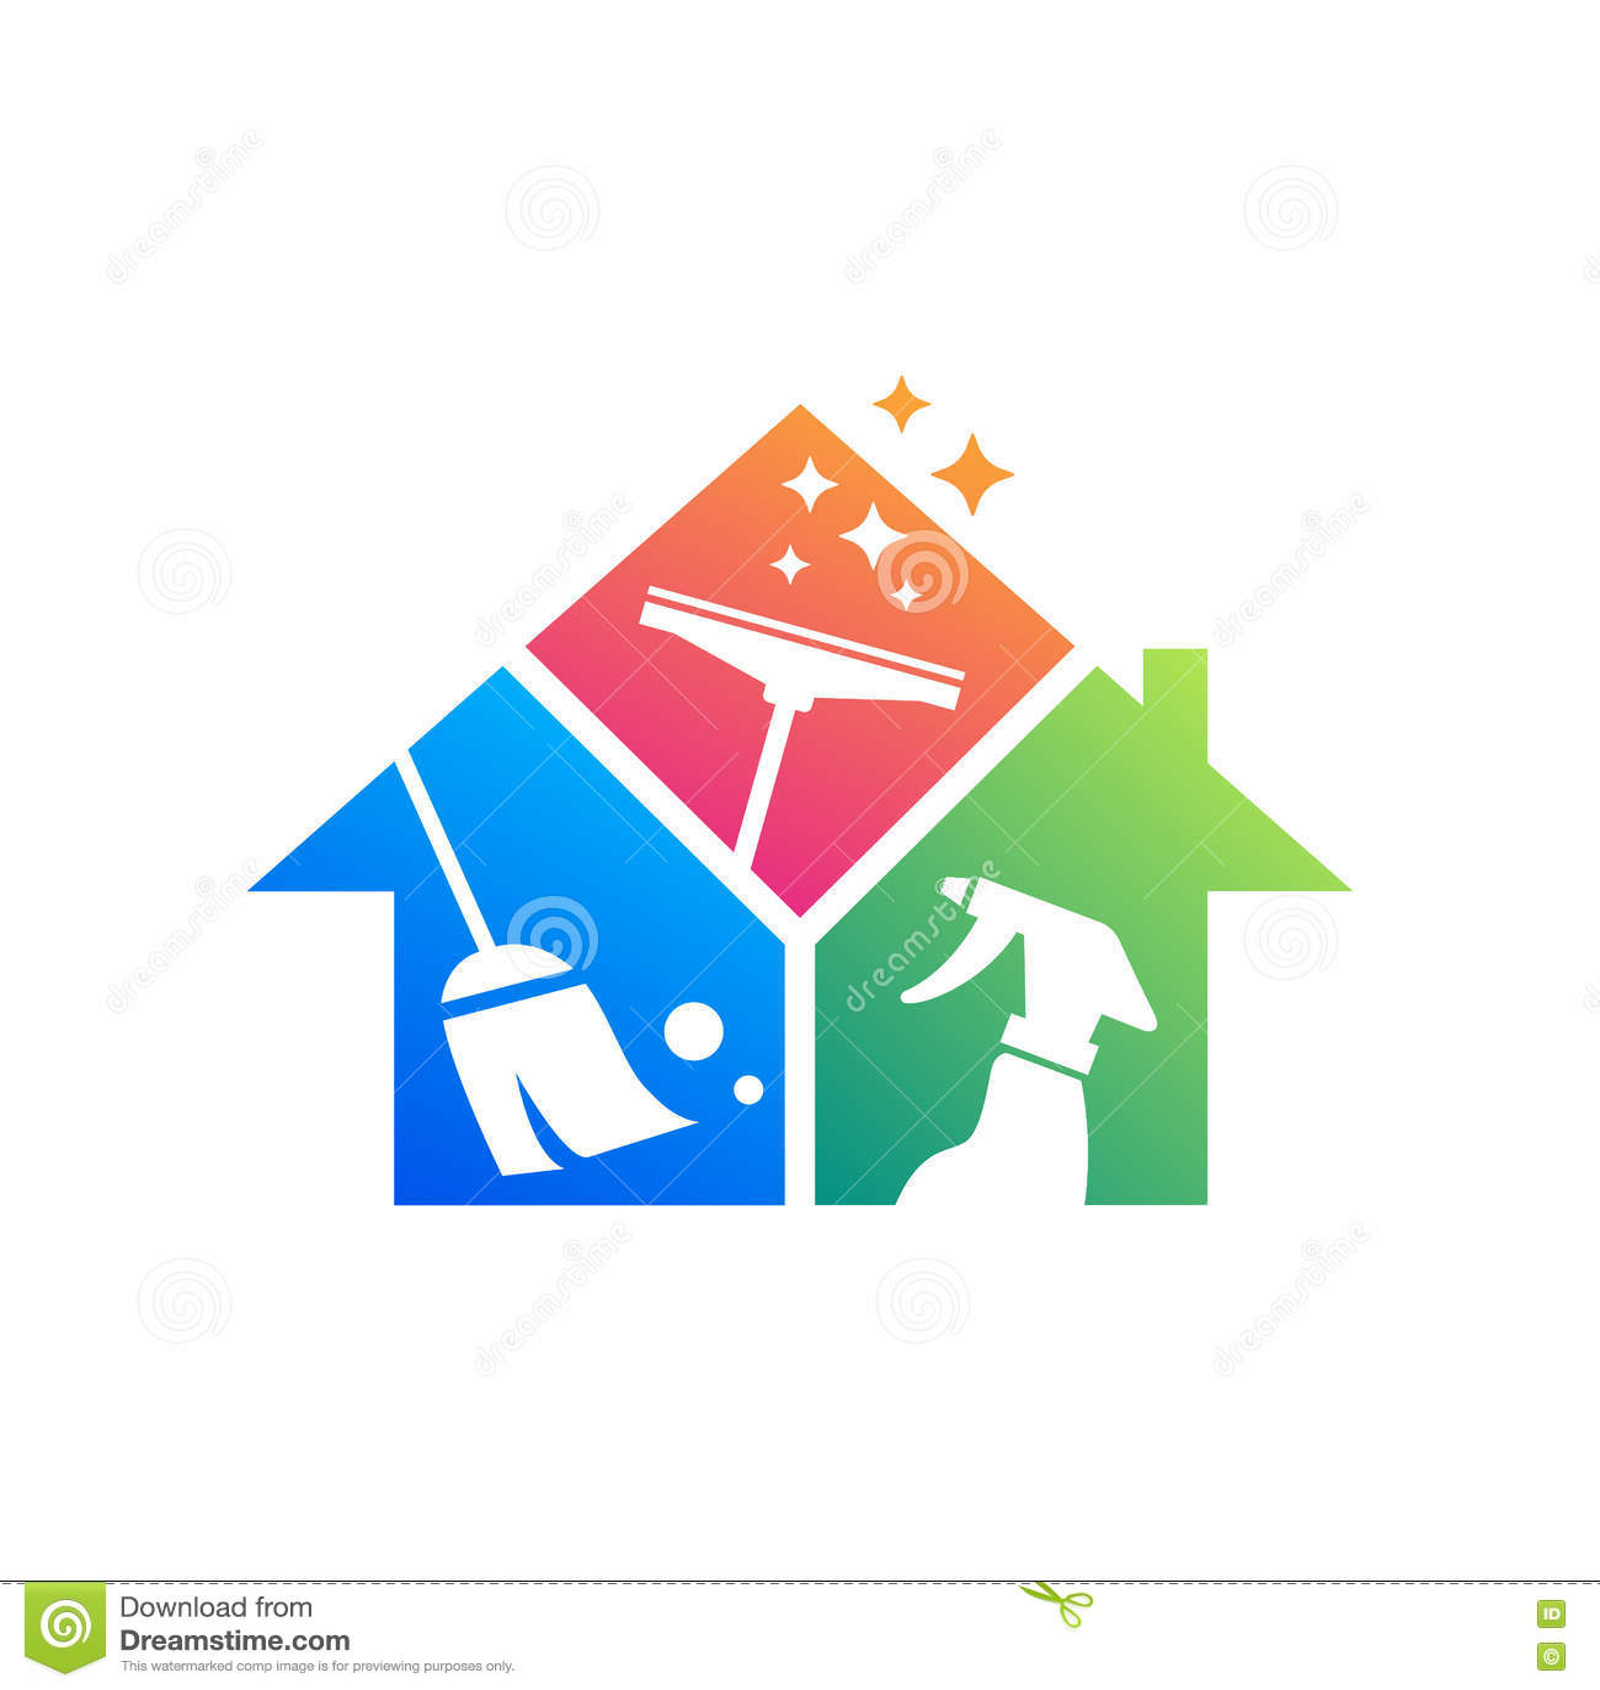 Building Cleaning Service Logo : Cleaning service logo design idea creative eco symbol